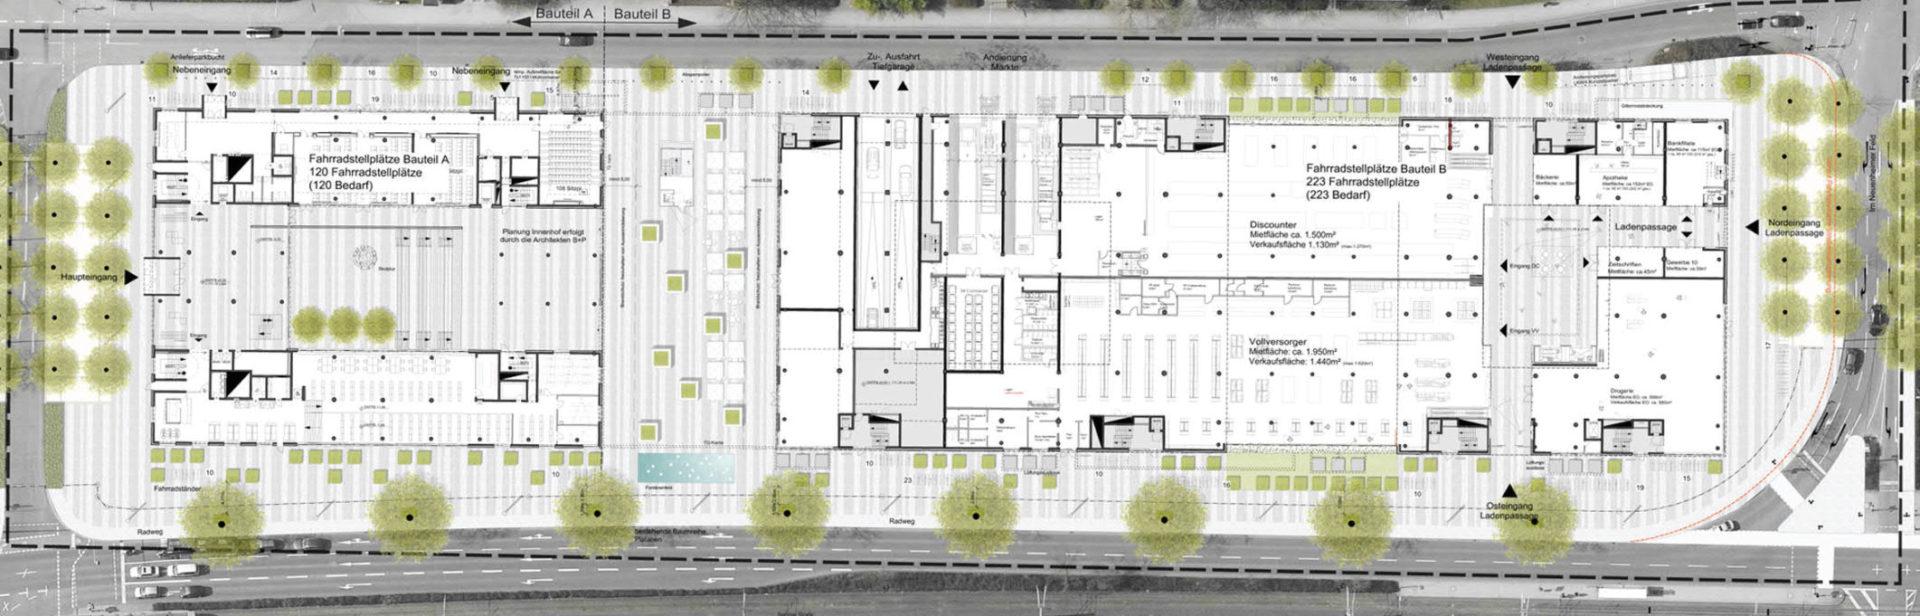 Heidelberg, Mathematikon - Plan